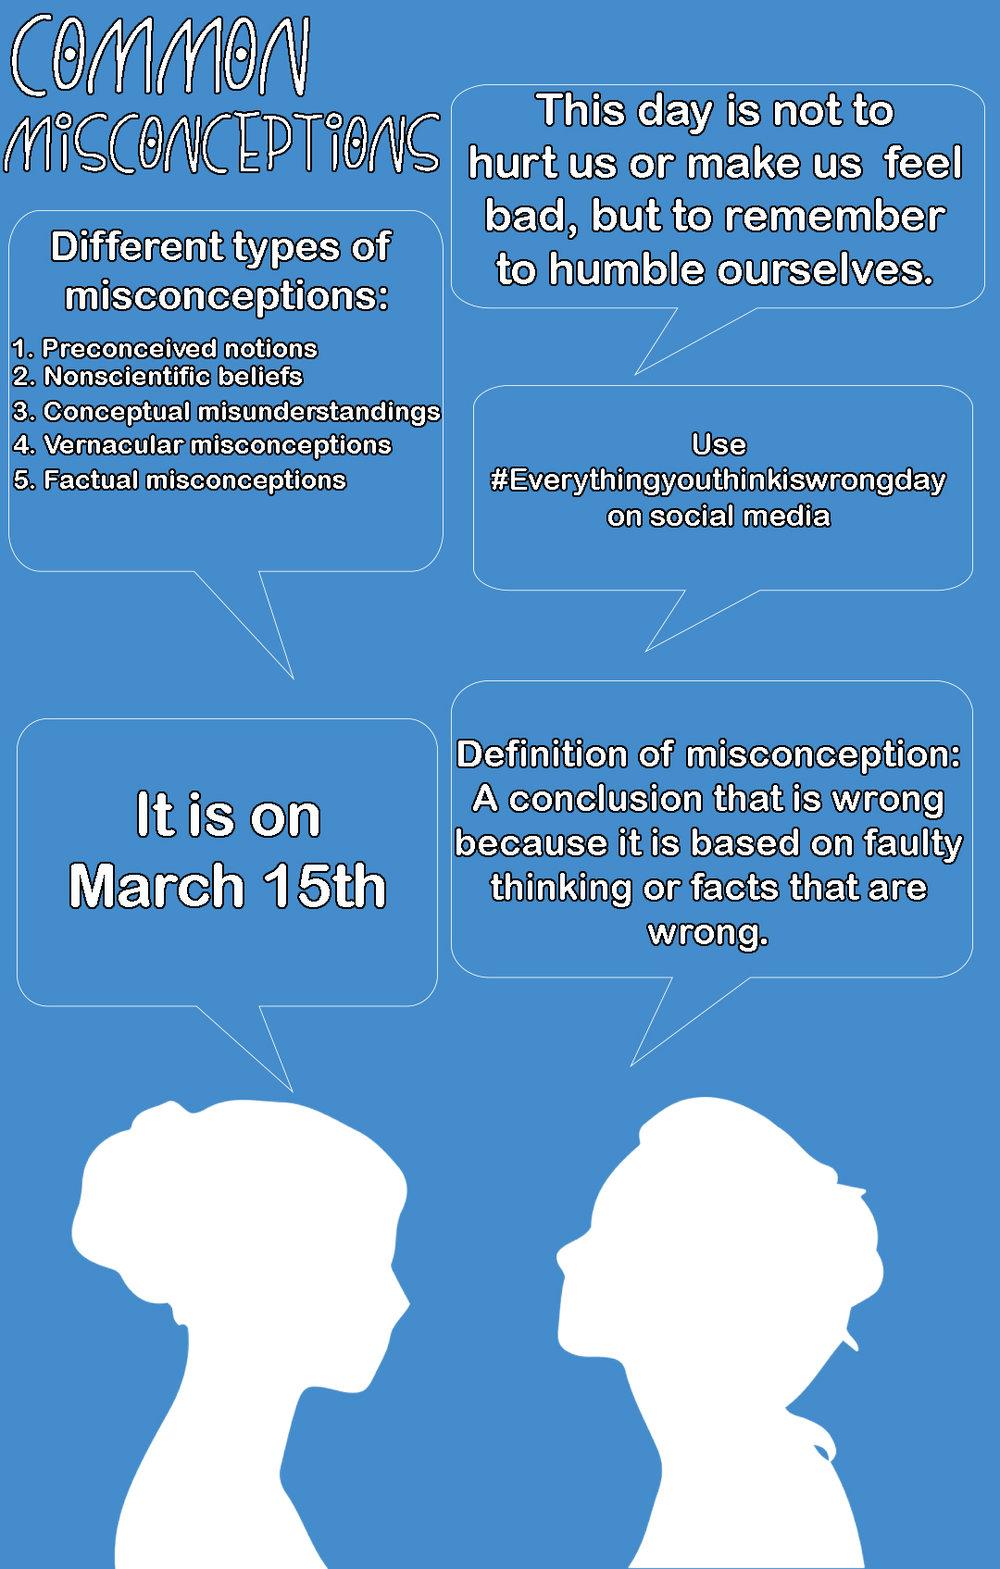 infographic_misconception2 - practicum.jpg